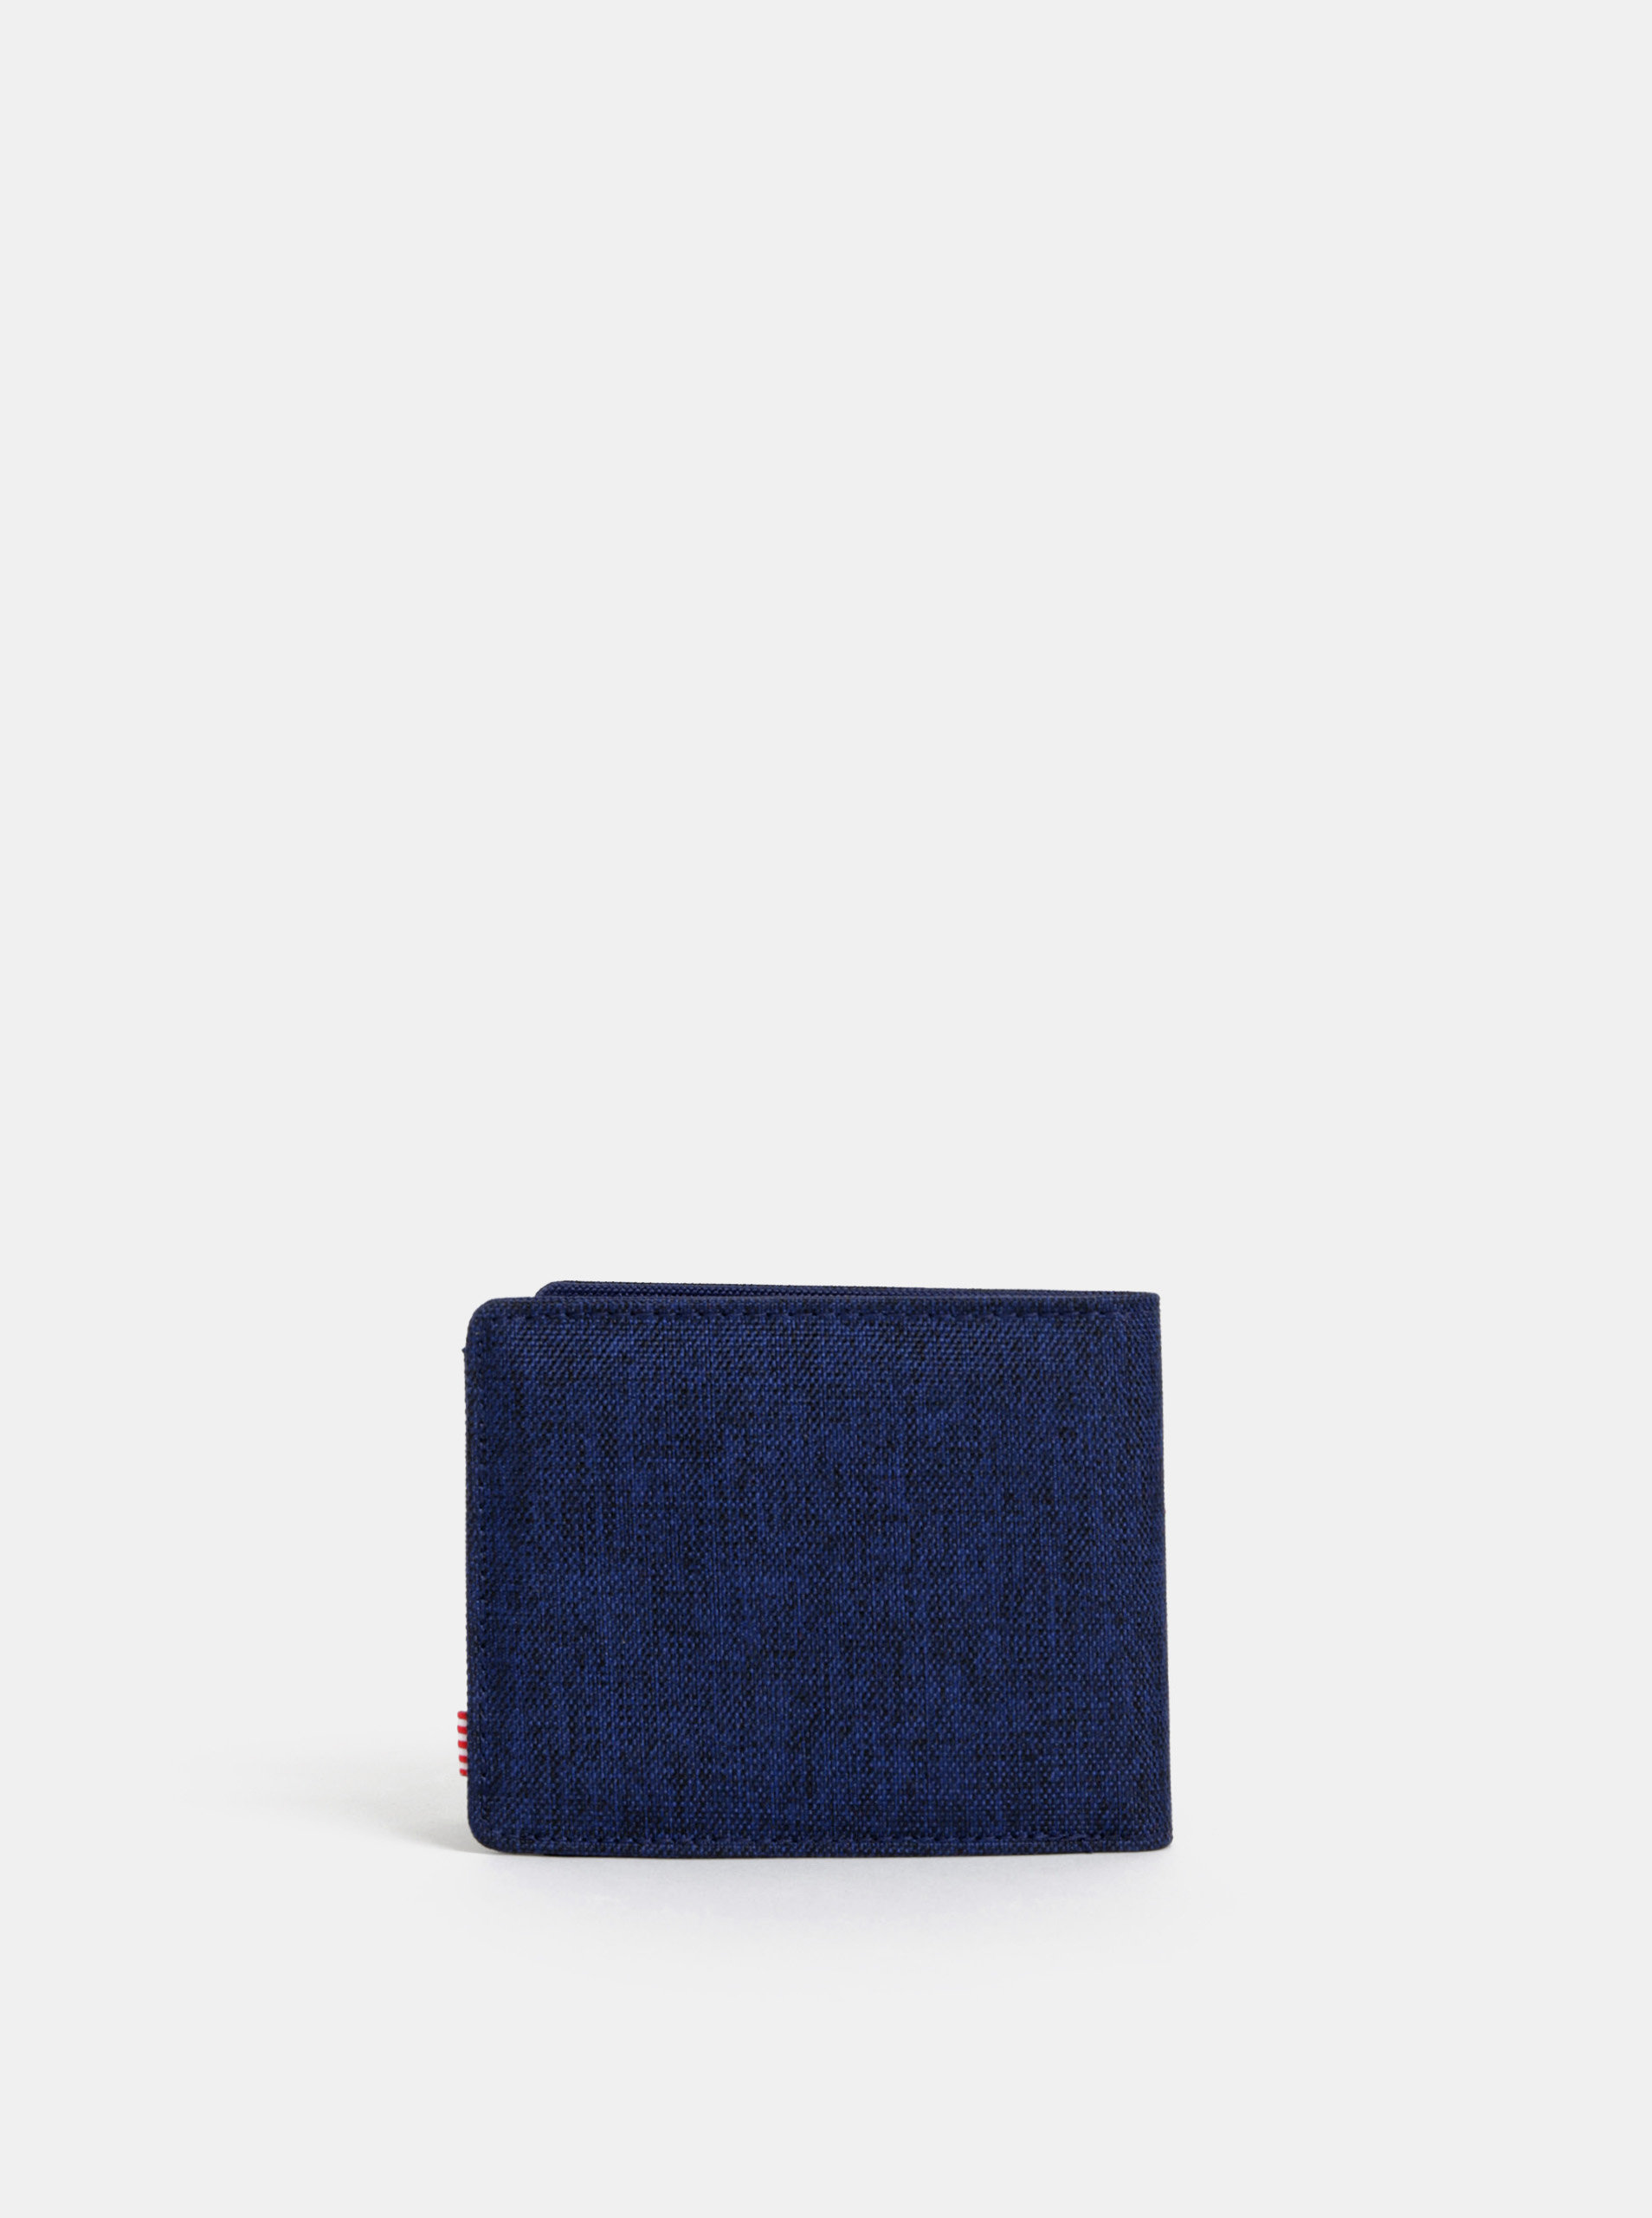 2be08b1530 Tmavomodrá pánska melírovaná peňaženka Herschel Roy ...